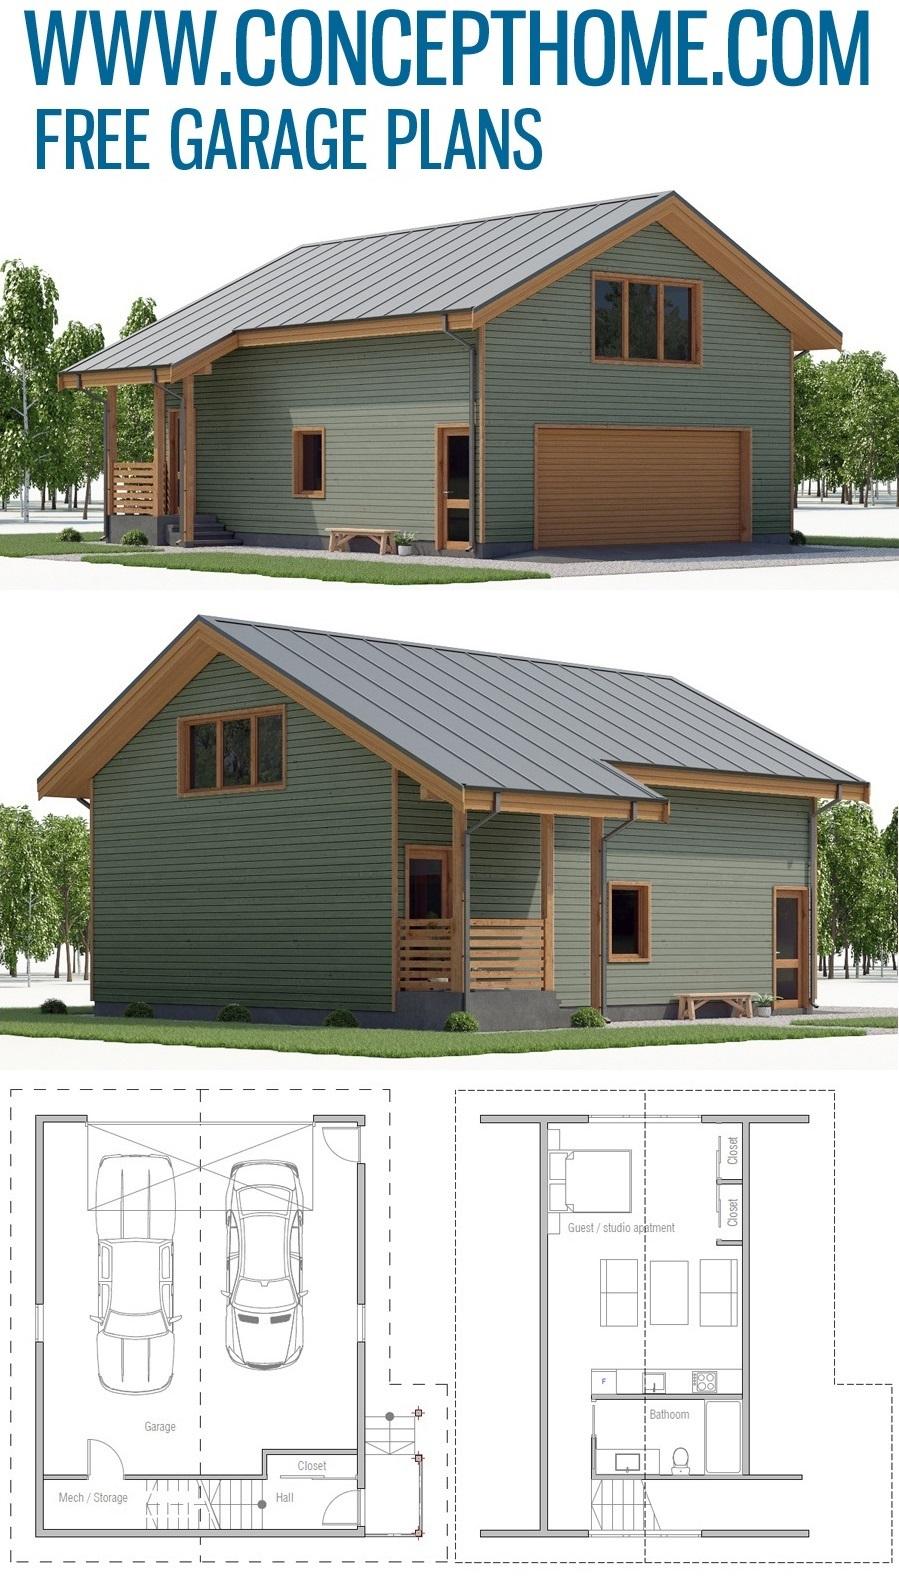 Garage Plan G810 Carriage House Plans Garage Apartment Plans House Plans